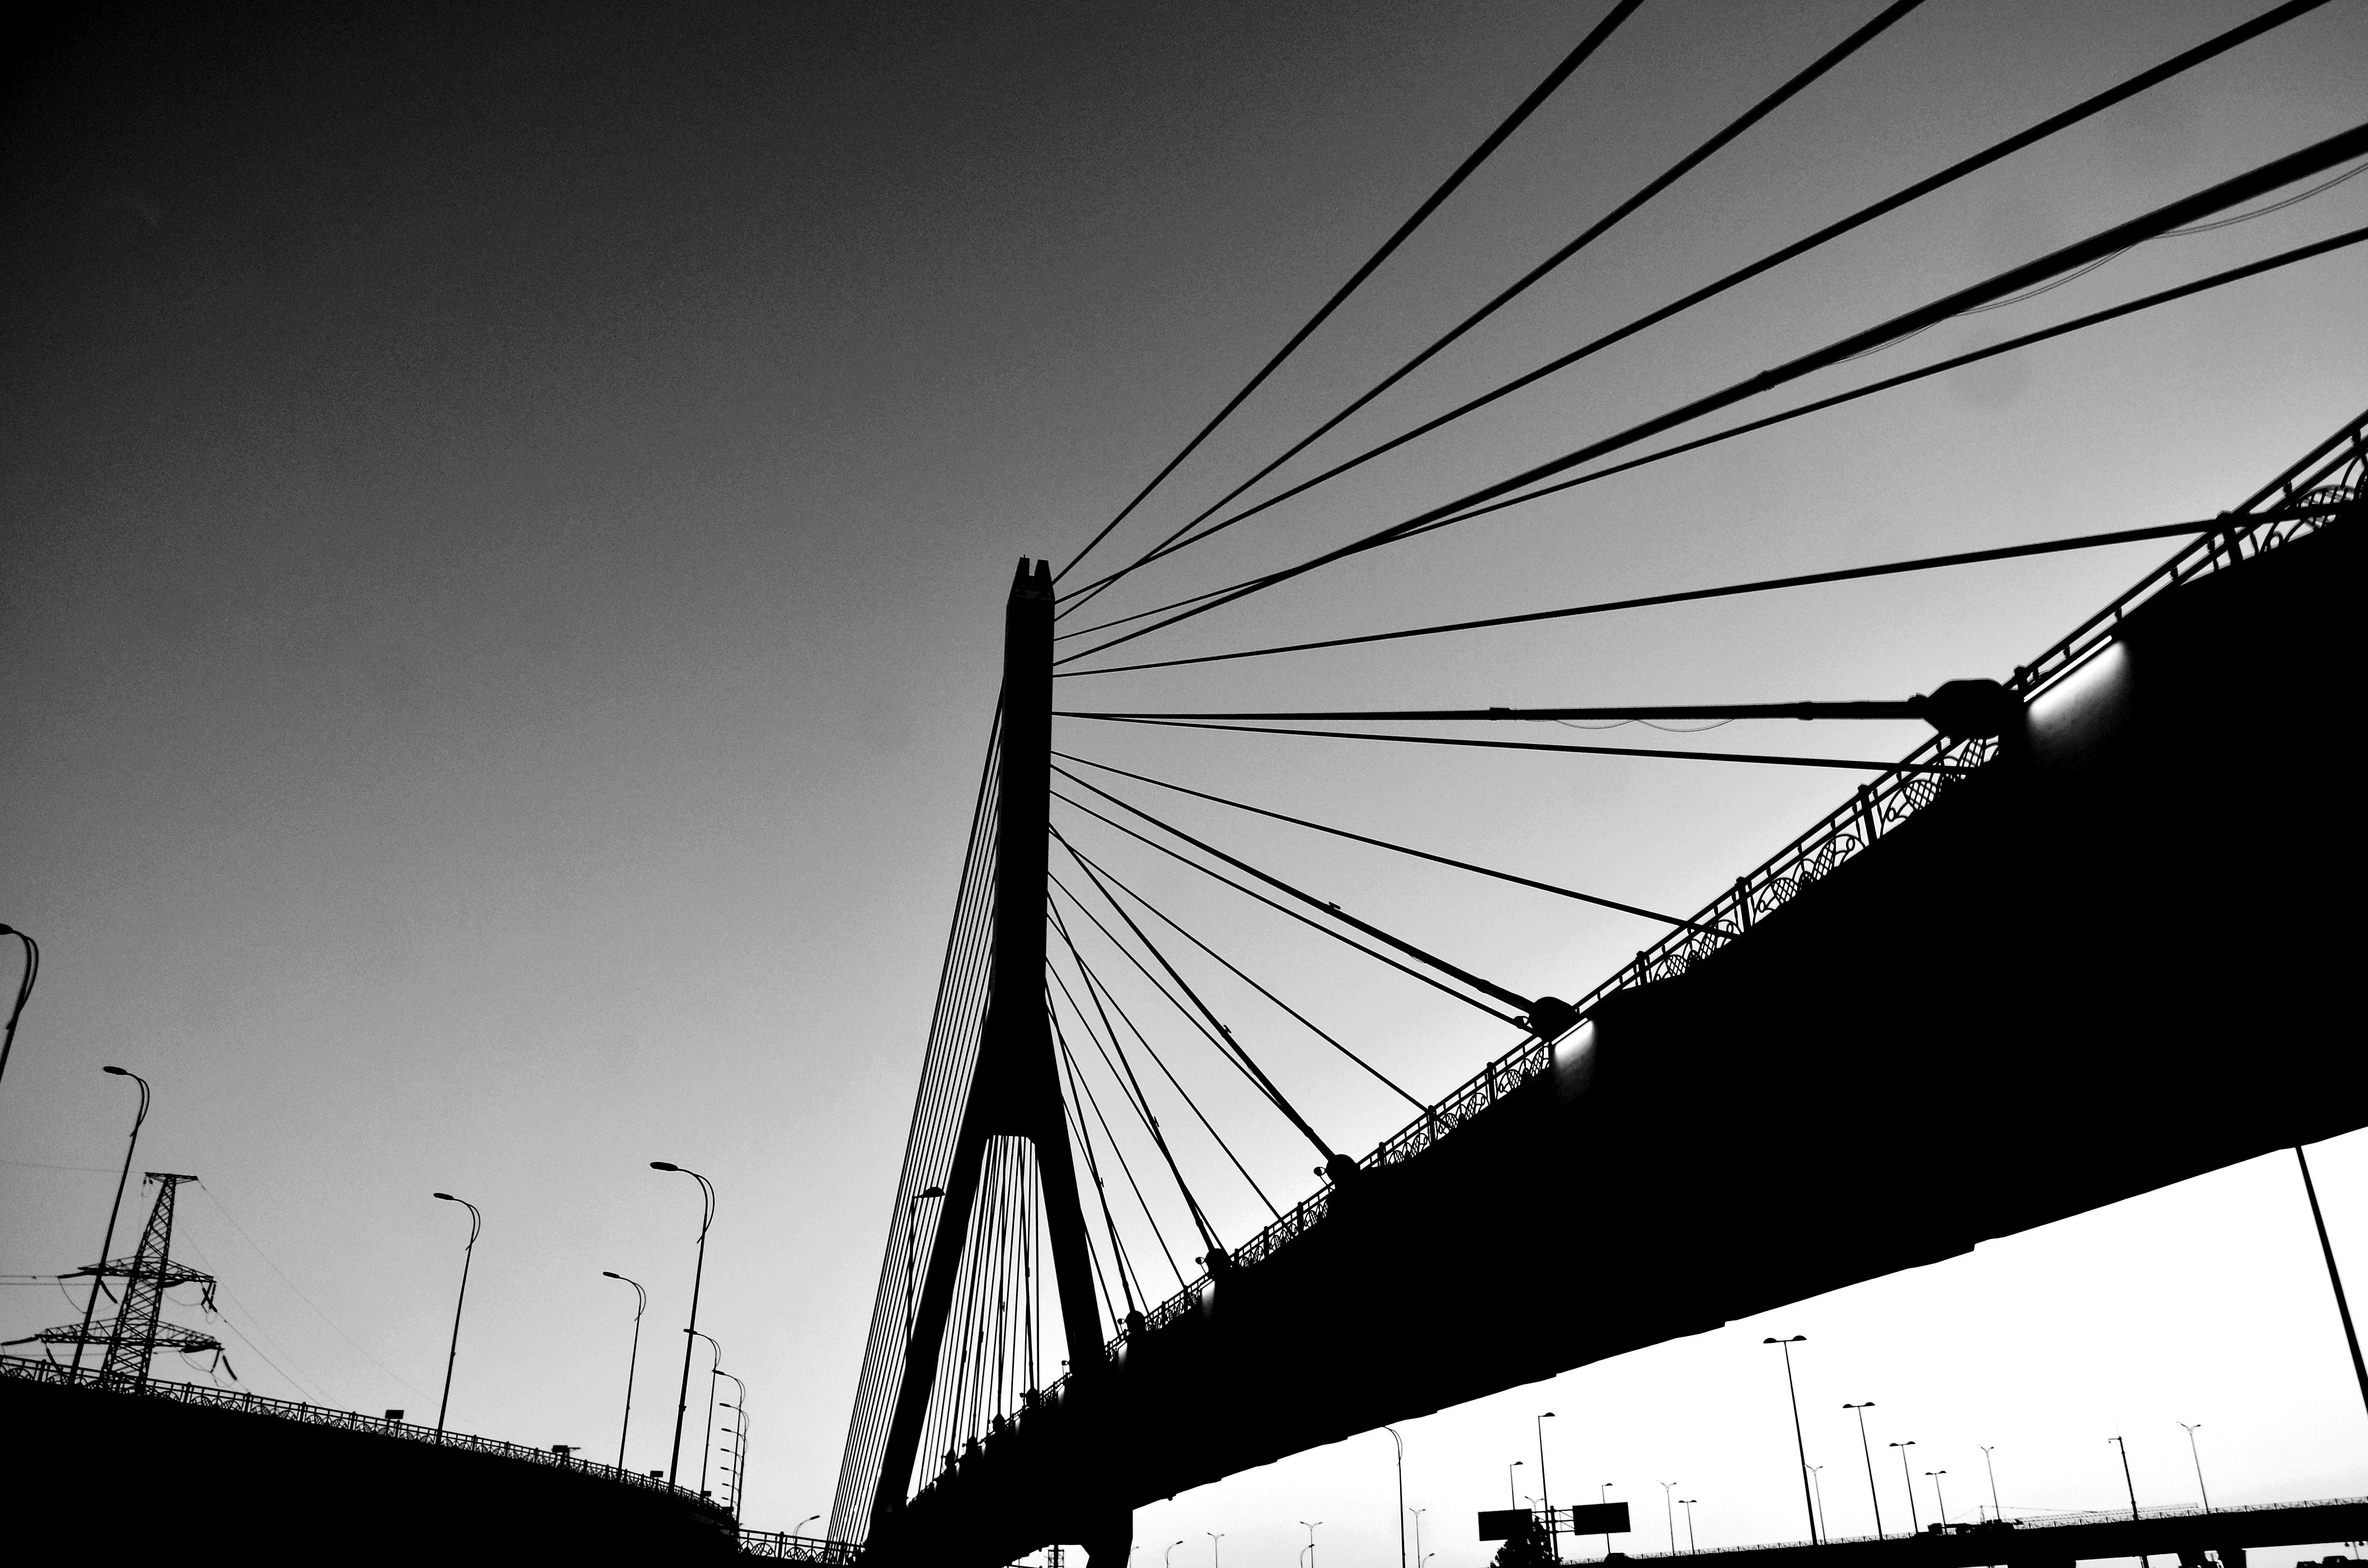 The longest bridge junction in the world